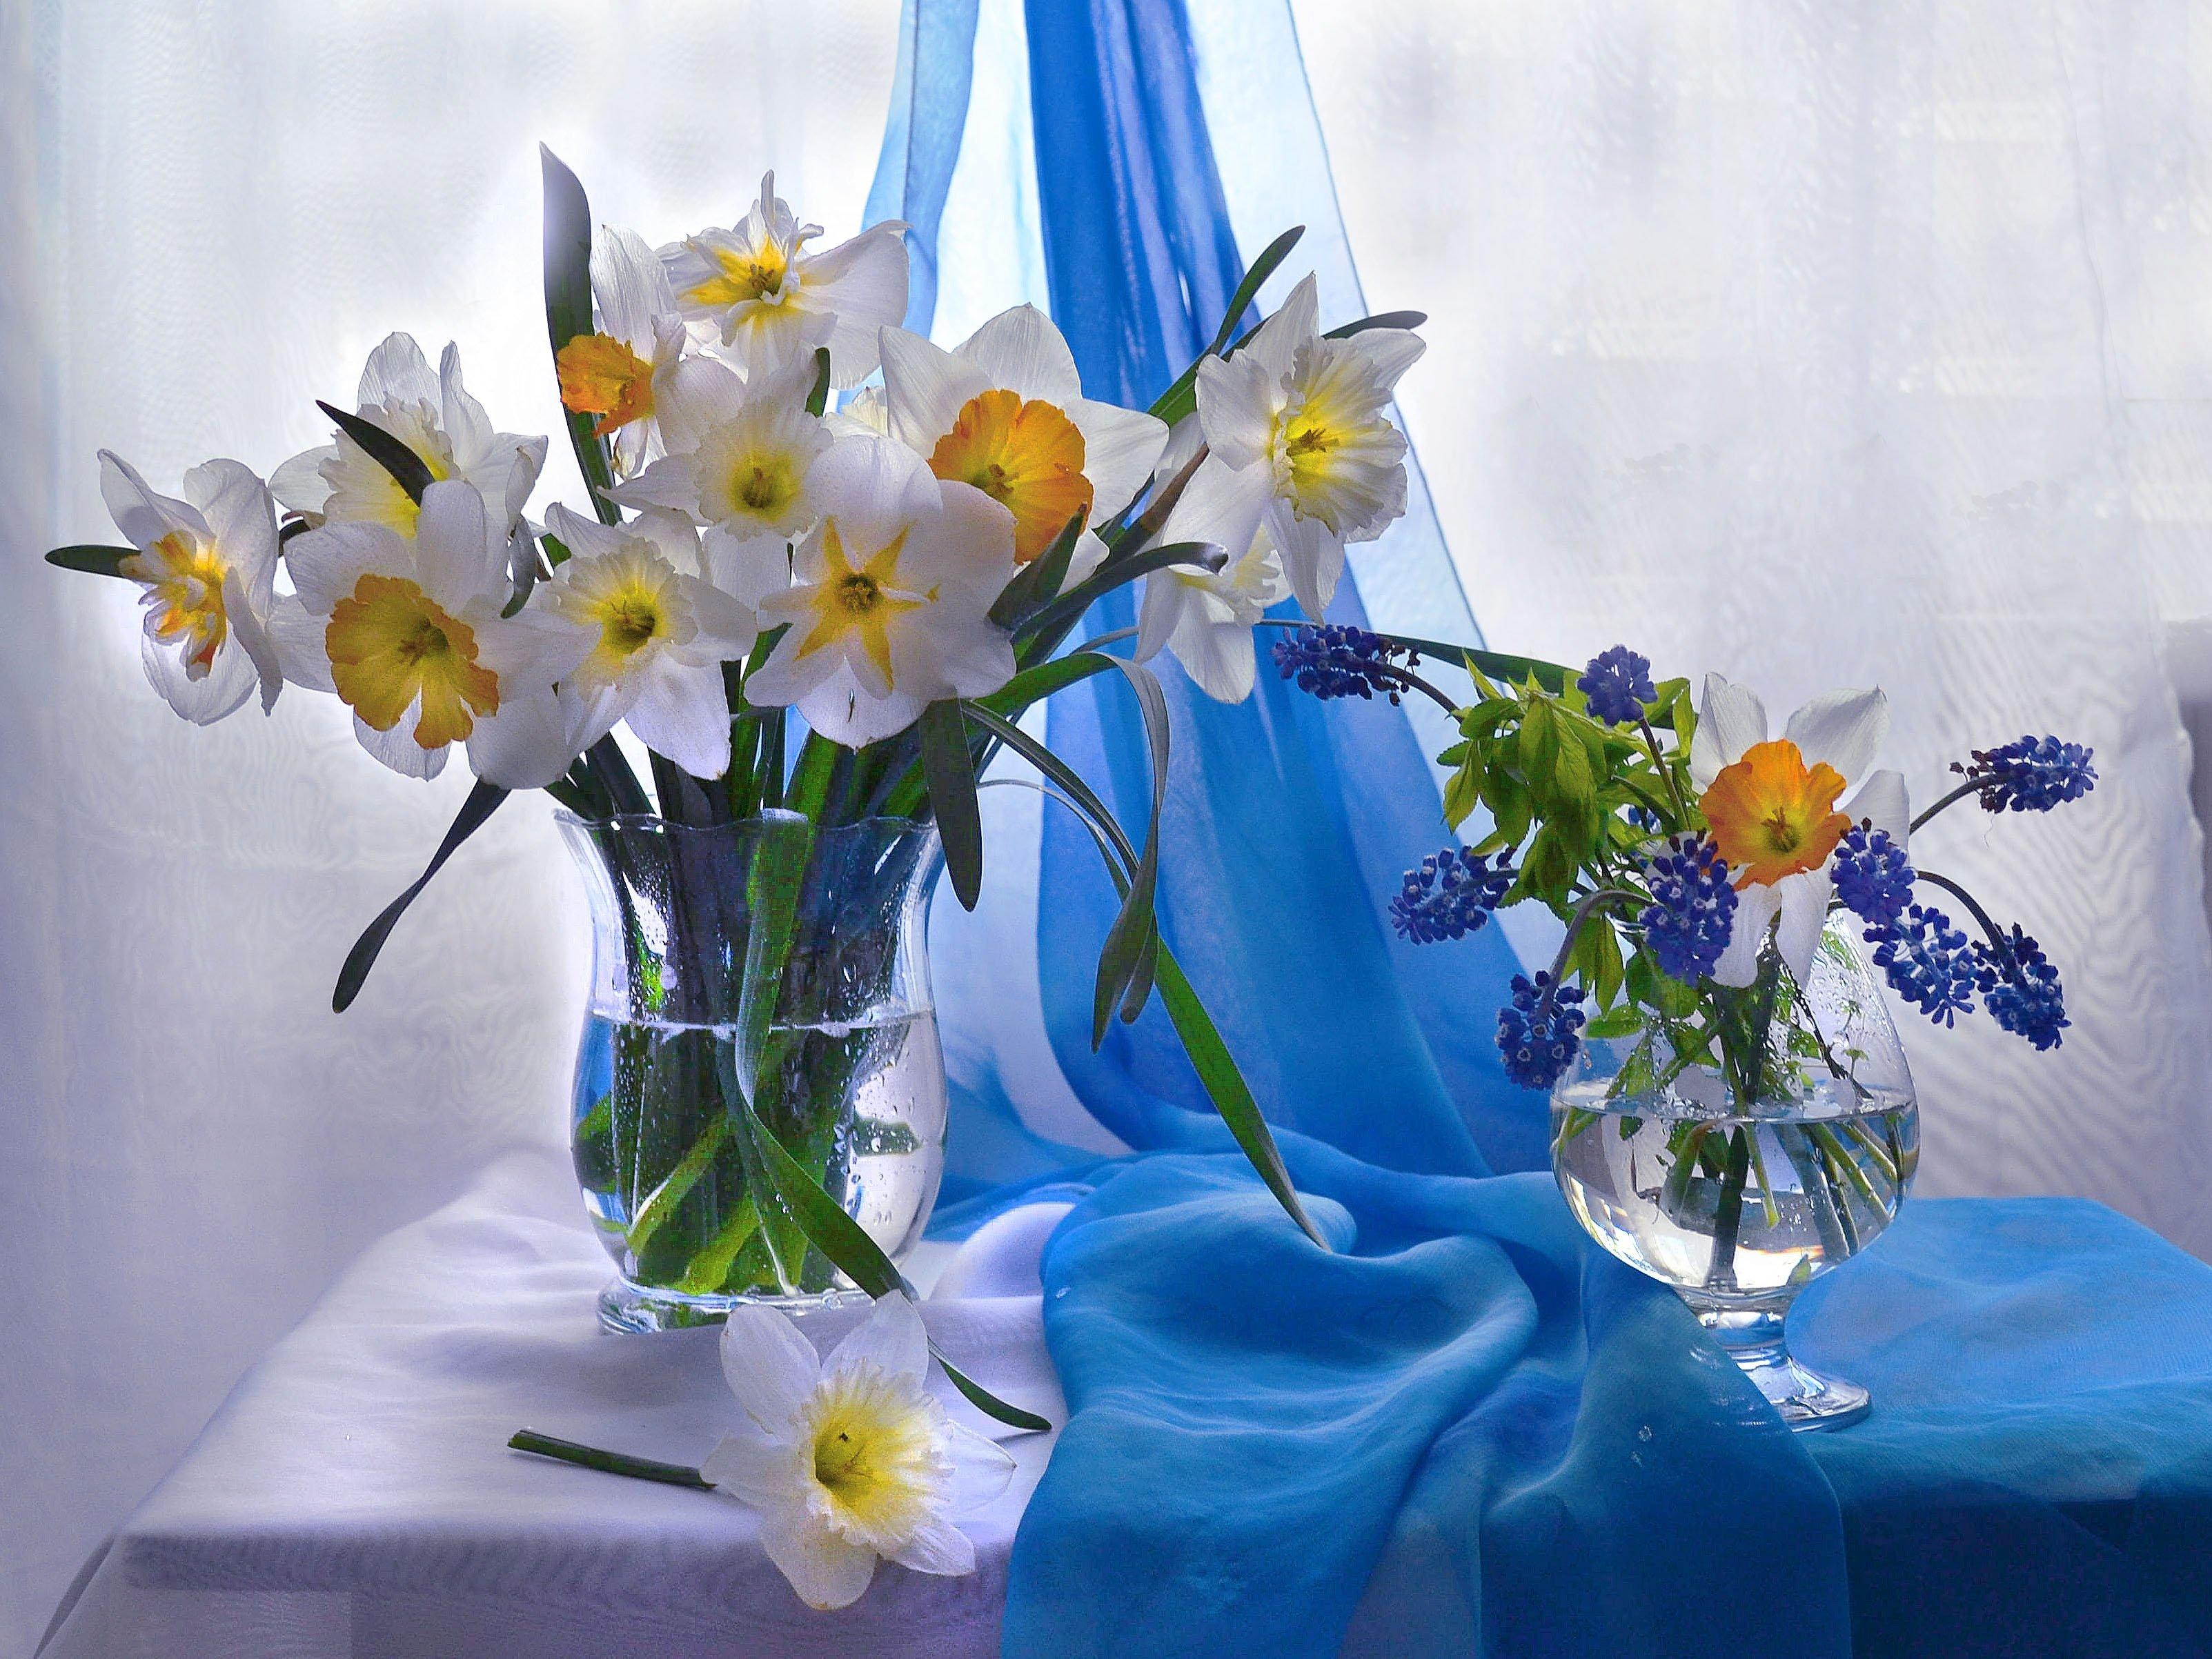 still life, натюрморт, весна, мускари, нарциссы, настроение., фото натюрморт, стихи, цветы, Колова Валентина